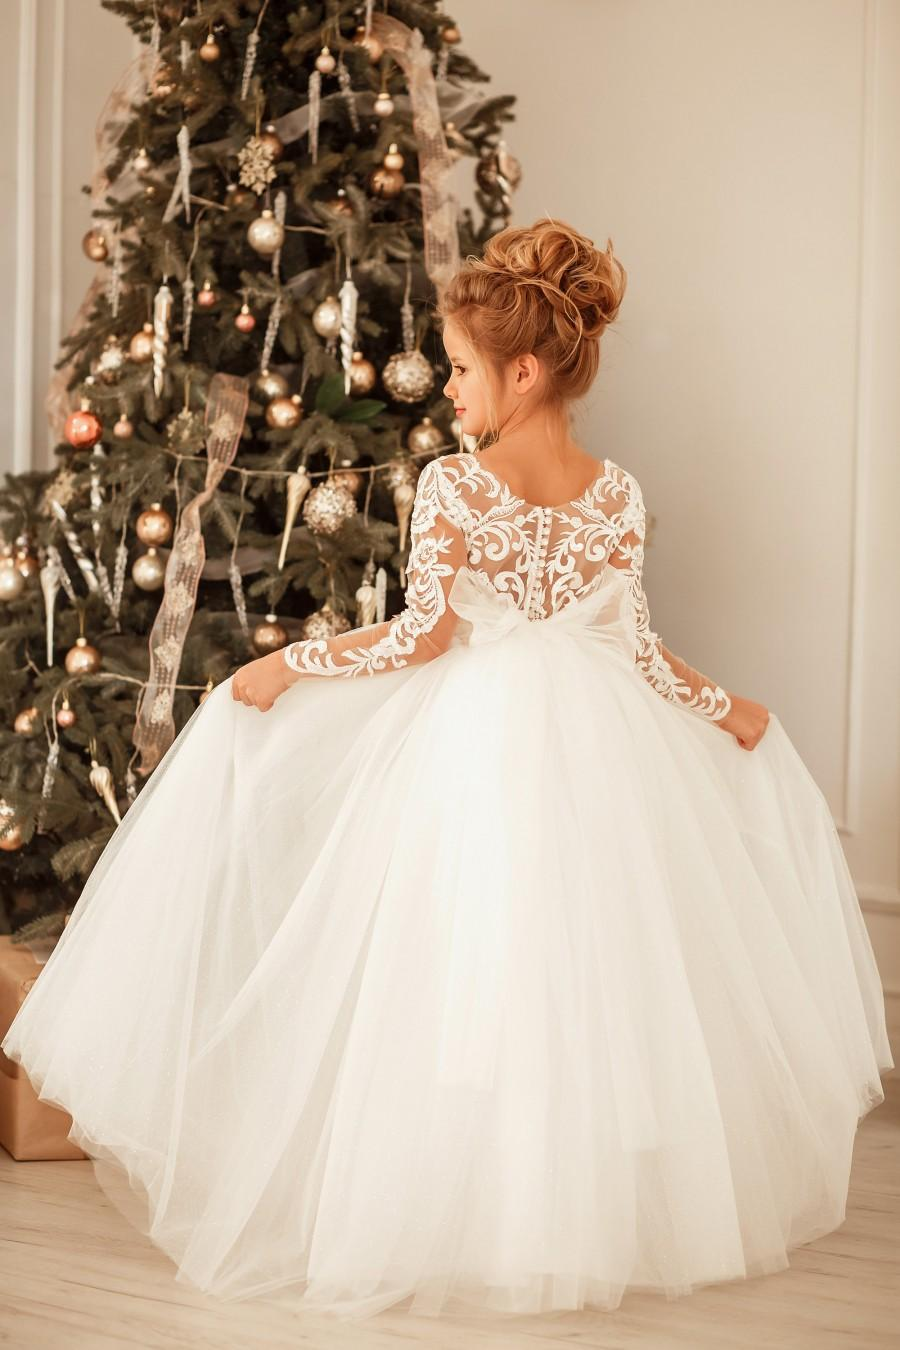 Wedding - Lace flower girl dress, Ivory tutu flower girl dress , Baby tulle dress, Ball gown girl dress, Toddler train dress, Communion girl dress